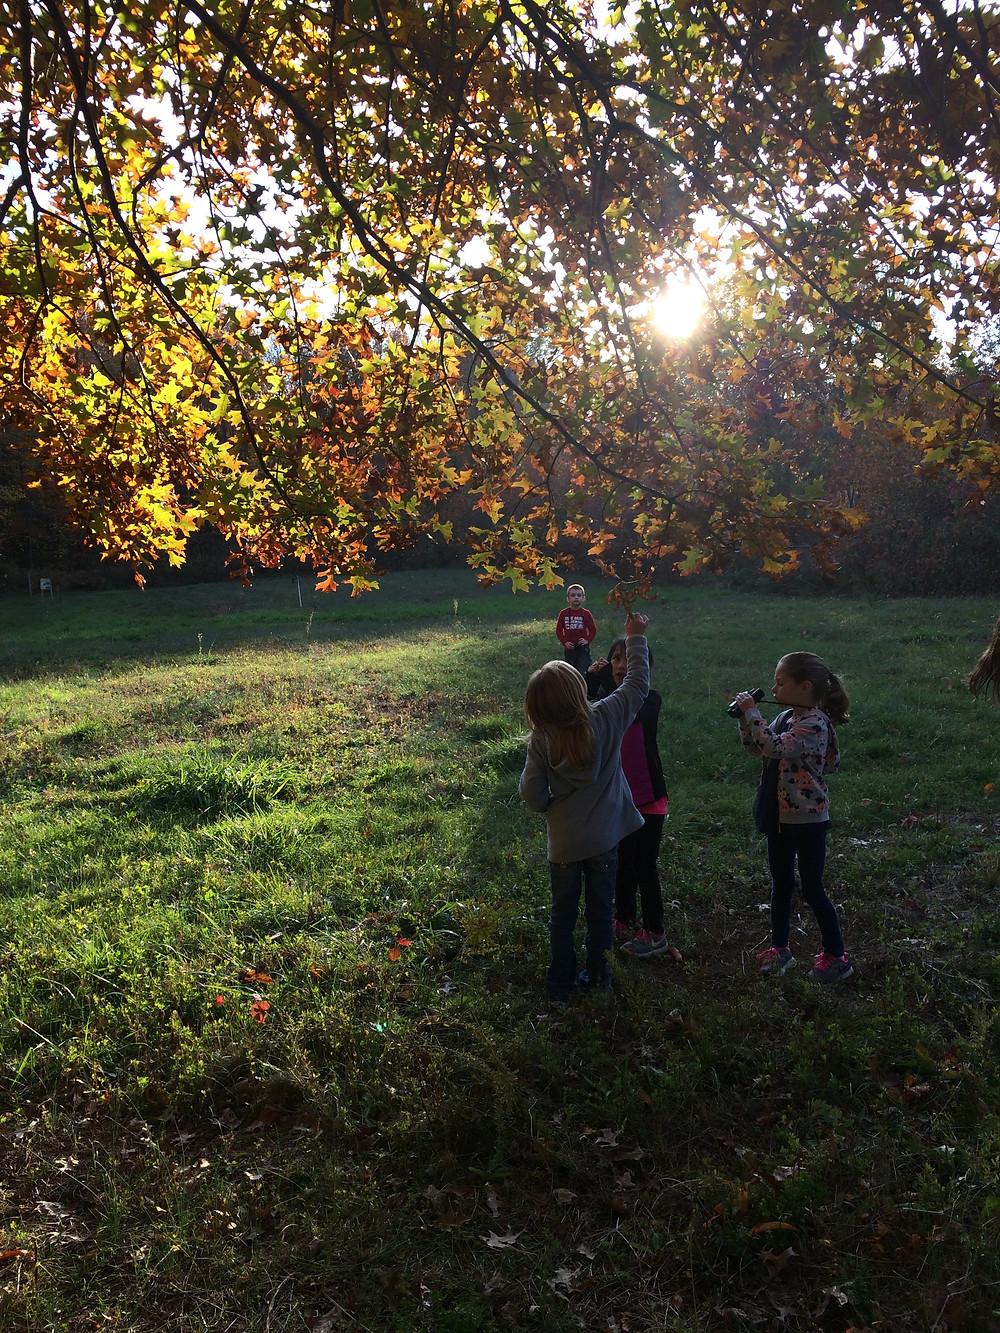 Wonderful fall foliage under our favorite Pin Oak!